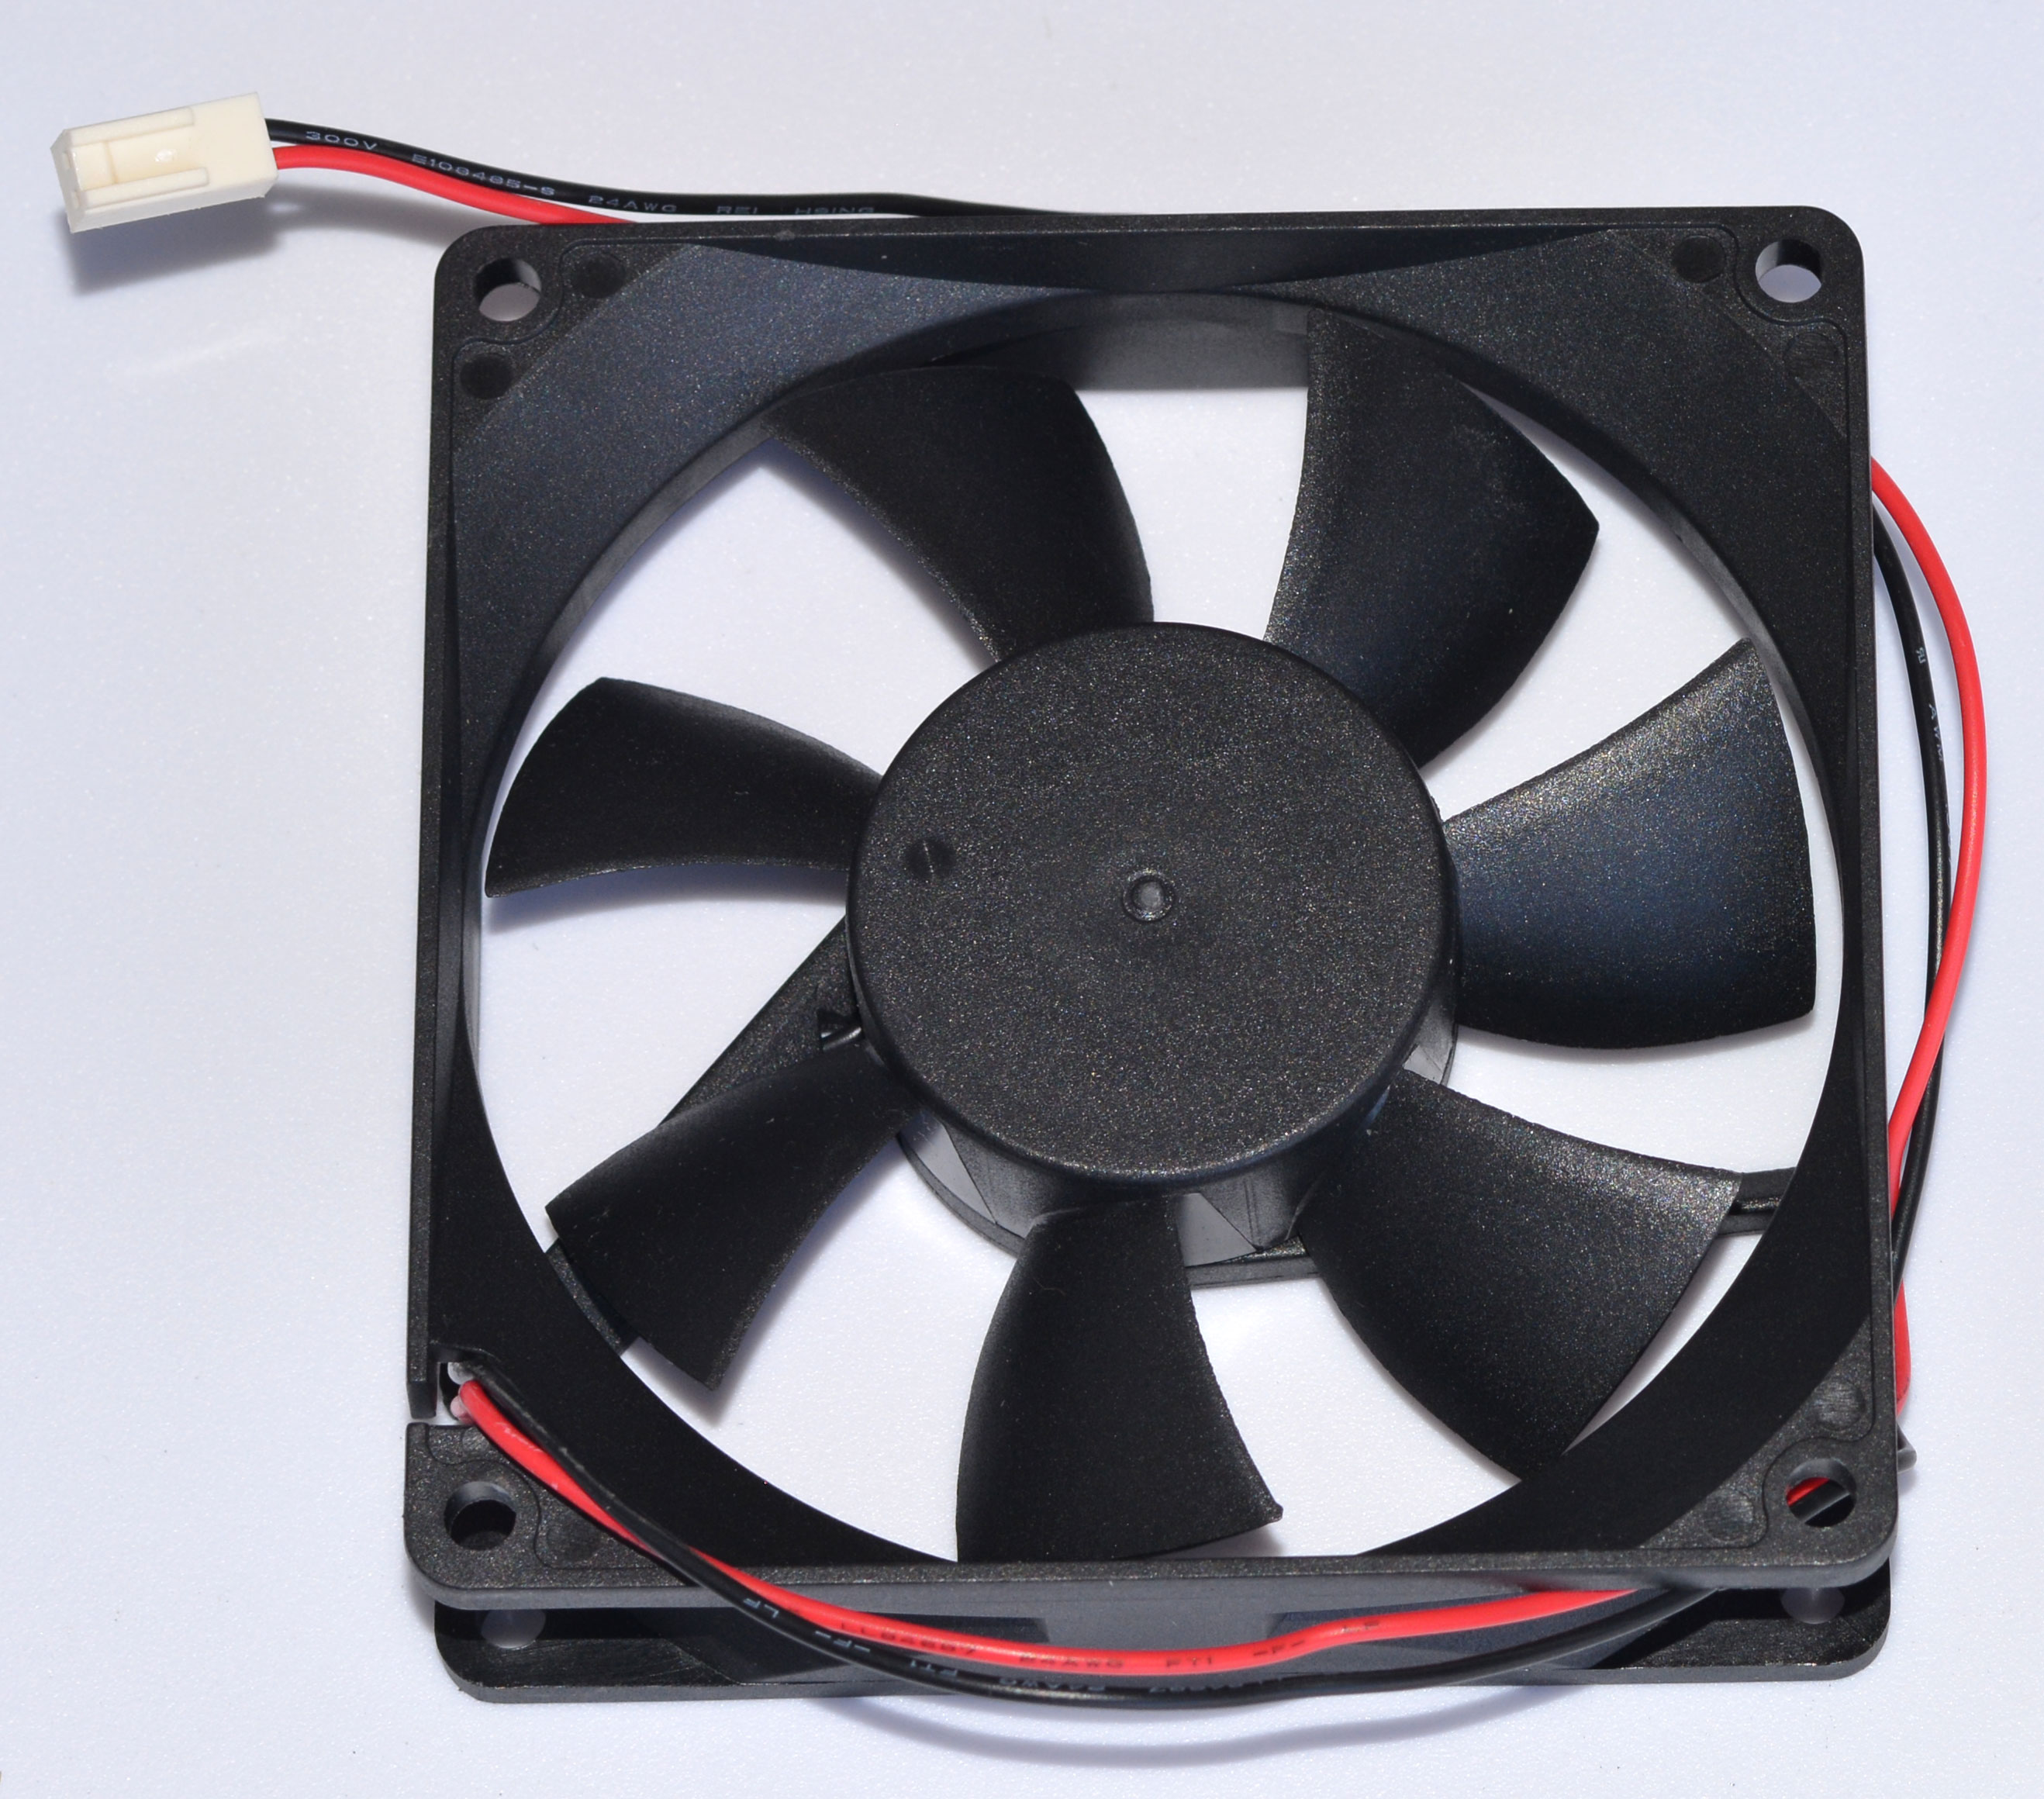 Portable Heater Parts Fan Blades : Dc fan for comfortzone portable heaters biosmart solutions